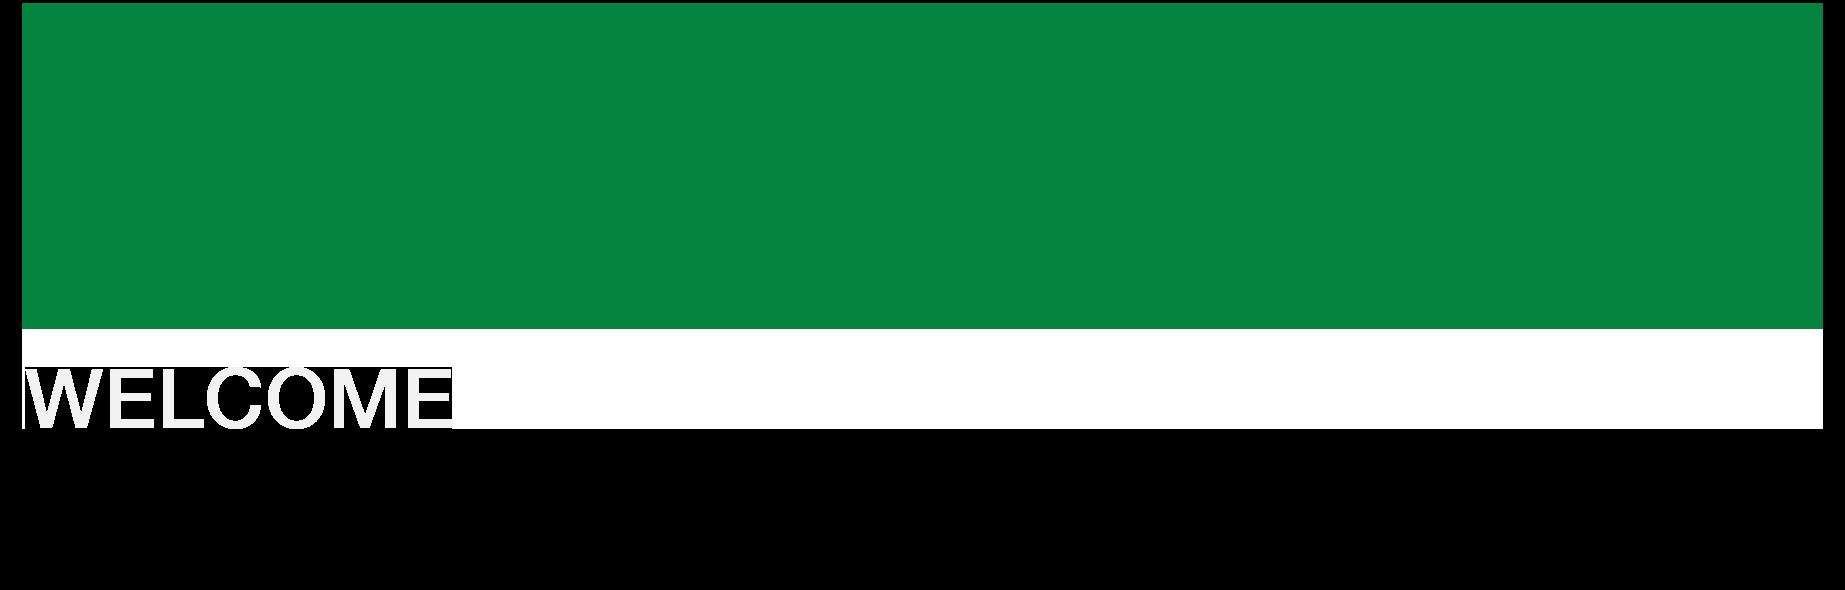 AL logo green welcom.png